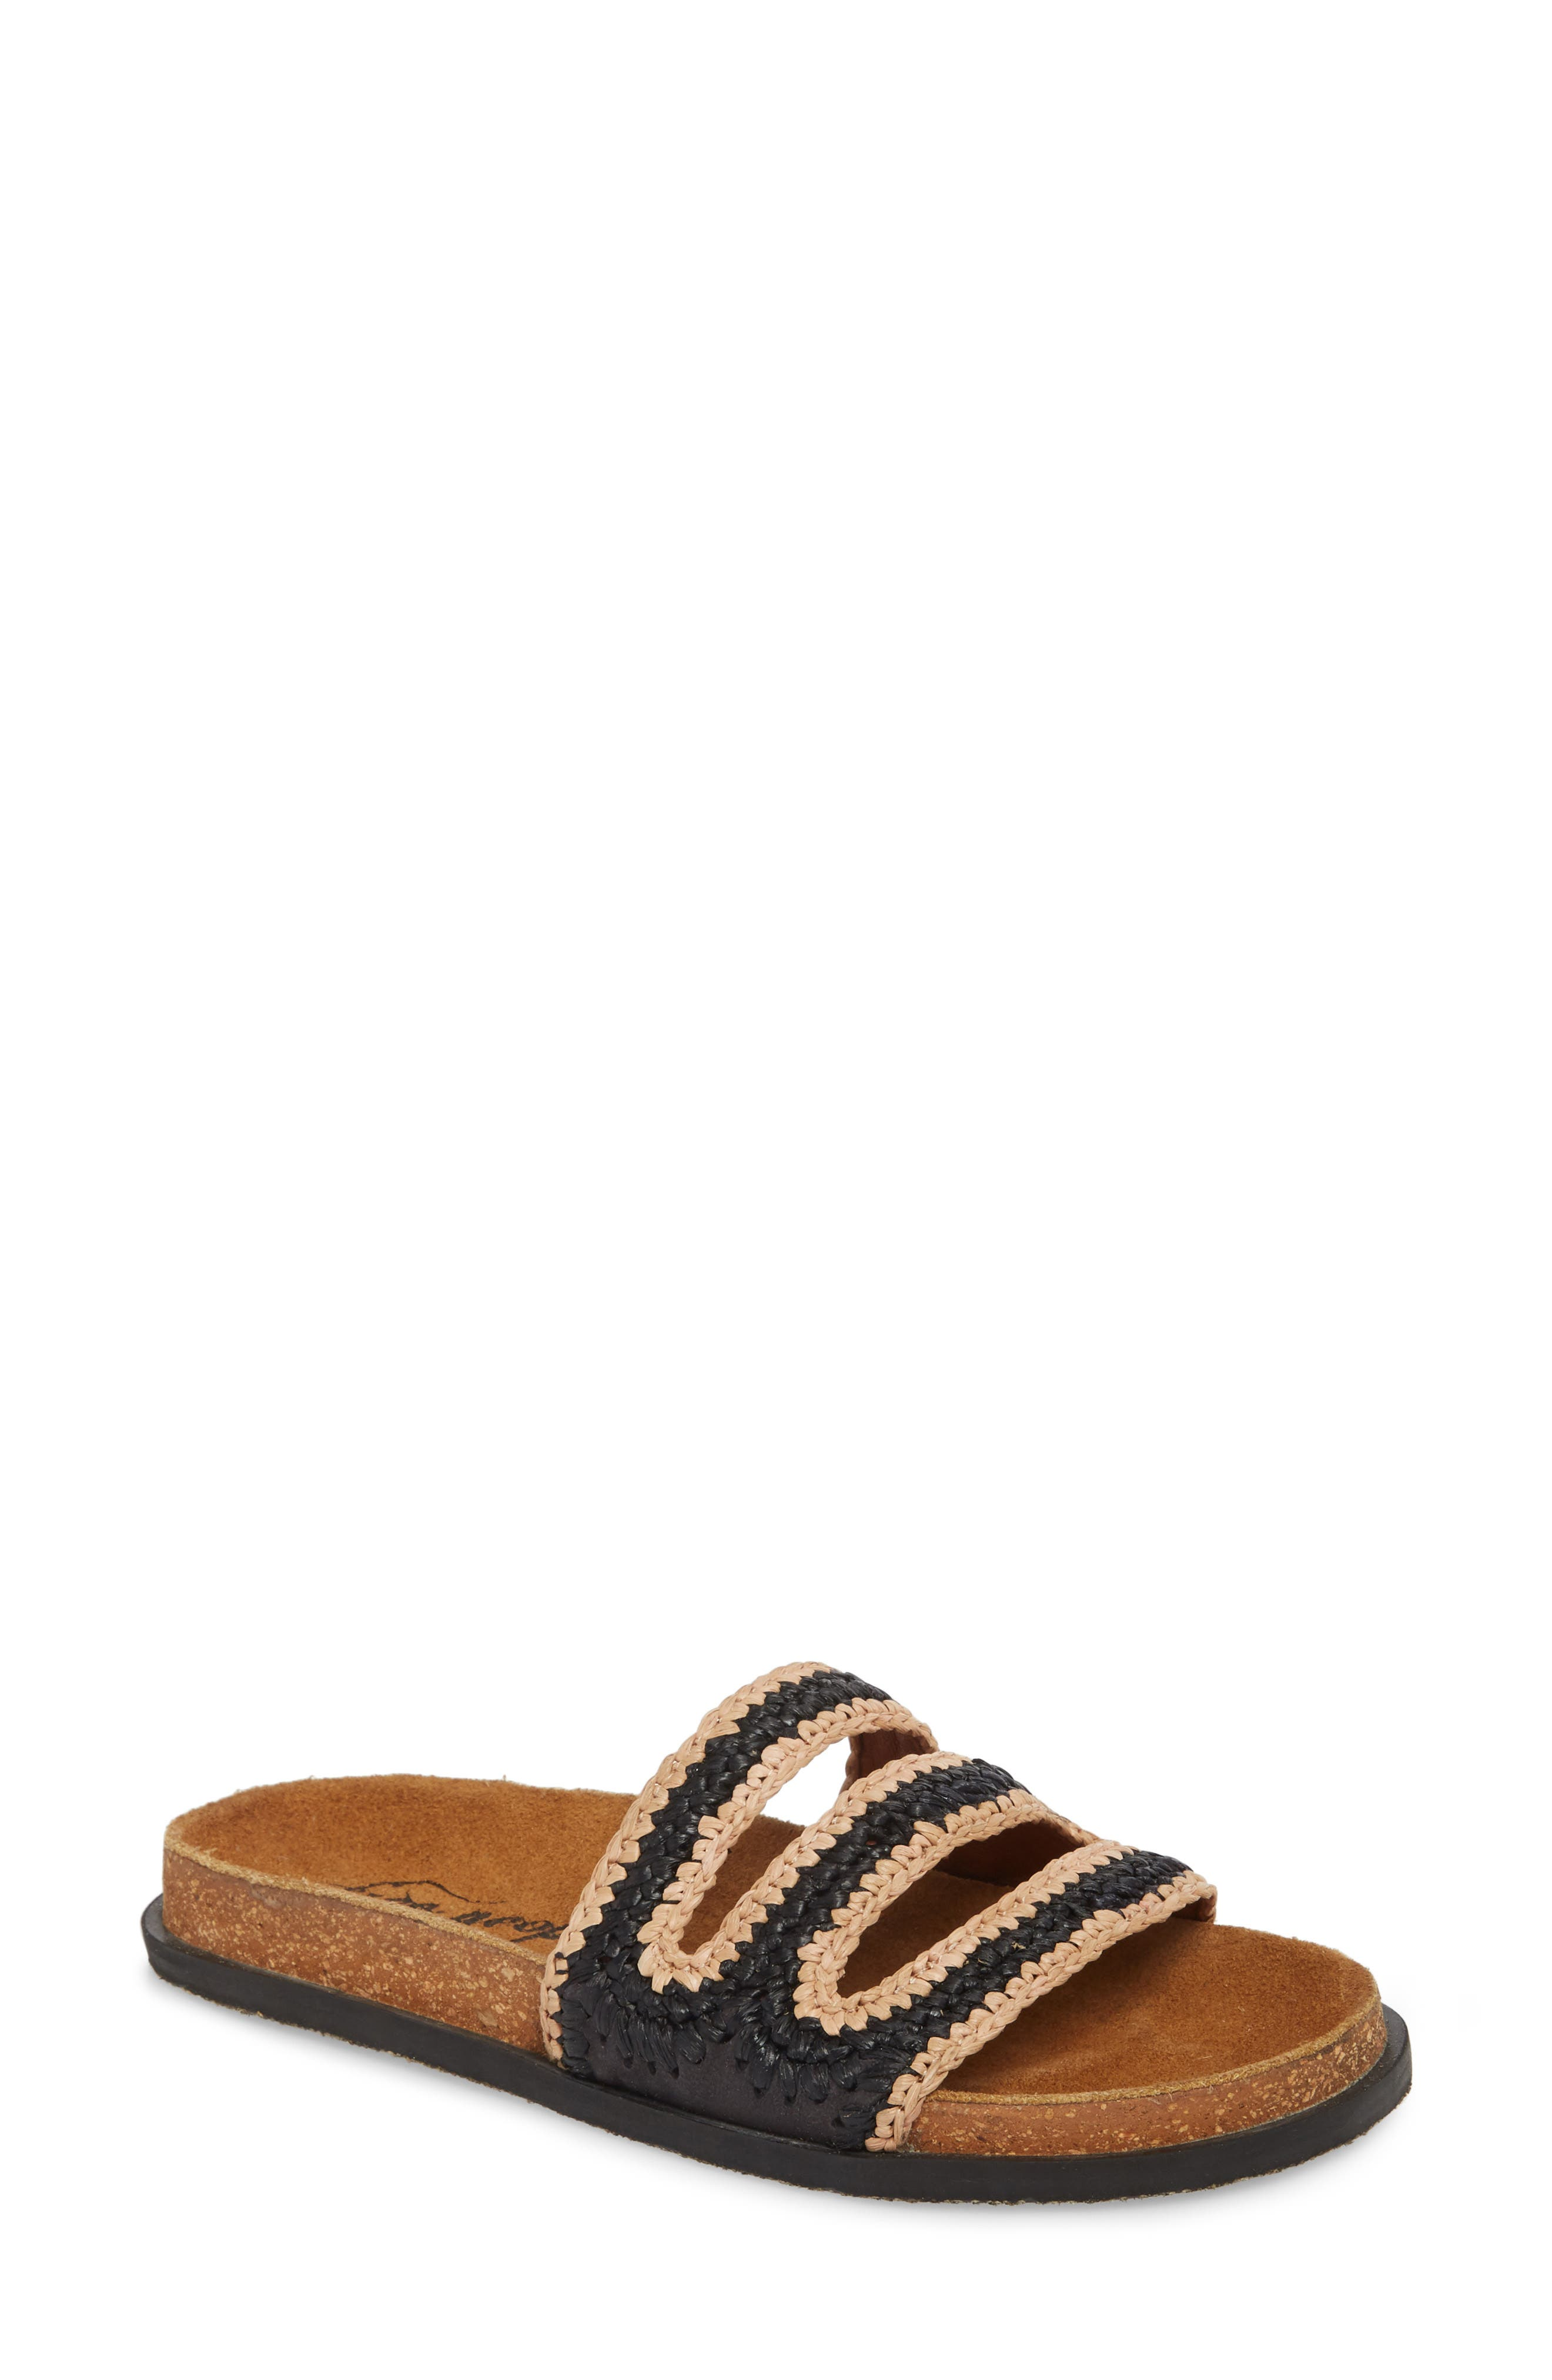 Crete Slide Sandal,                             Main thumbnail 1, color,